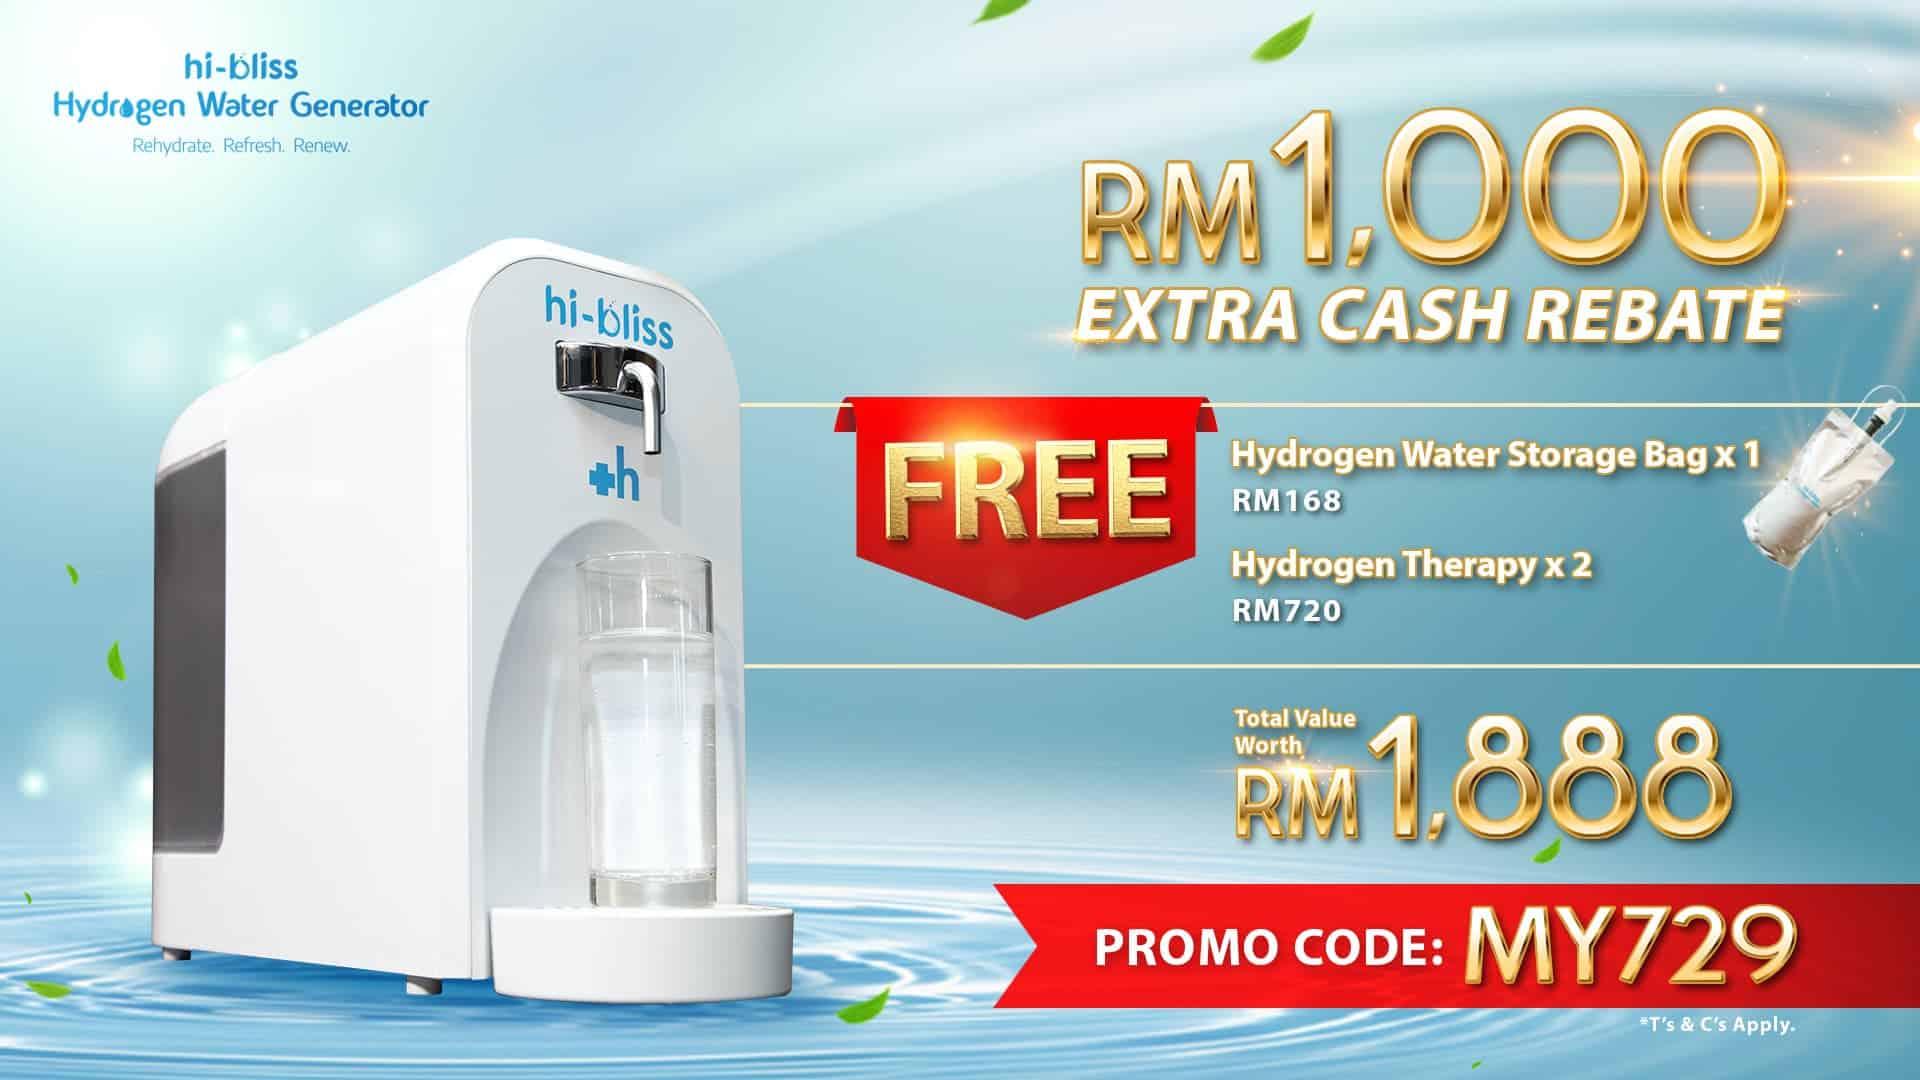 hibliss hydrogen water generator promo